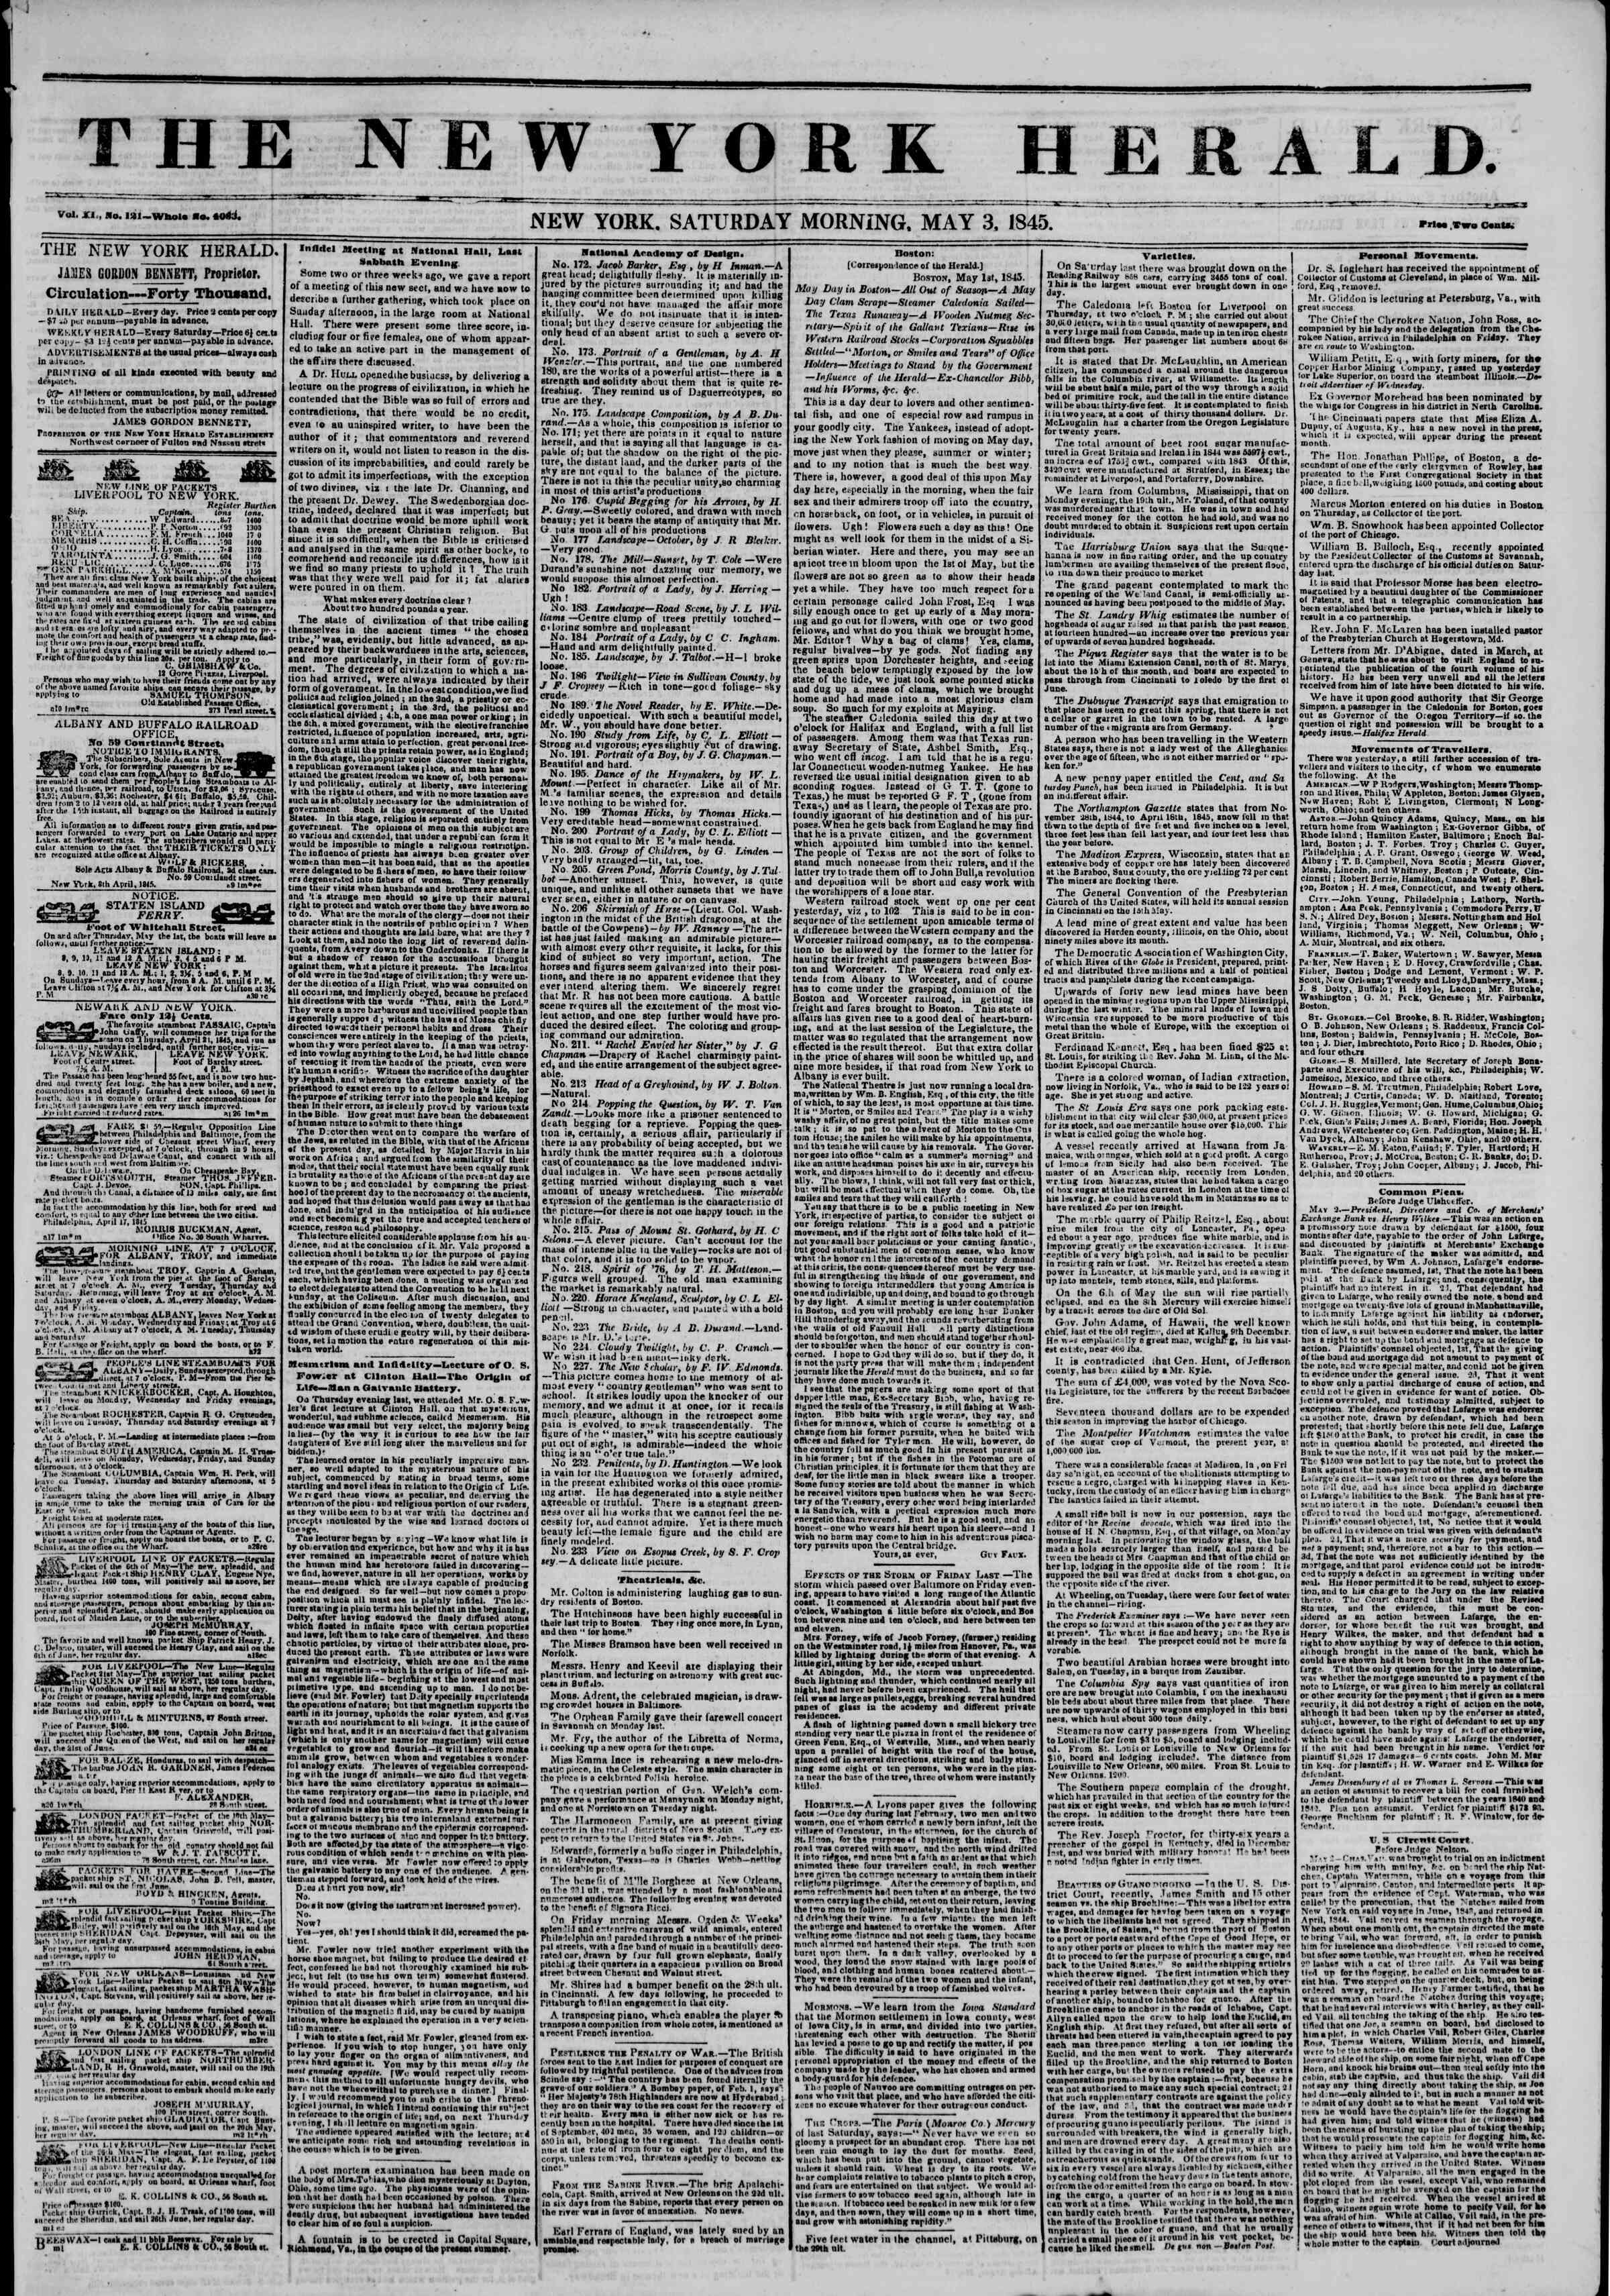 May 3, 1845 Tarihli The New York Herald Gazetesi Sayfa 1